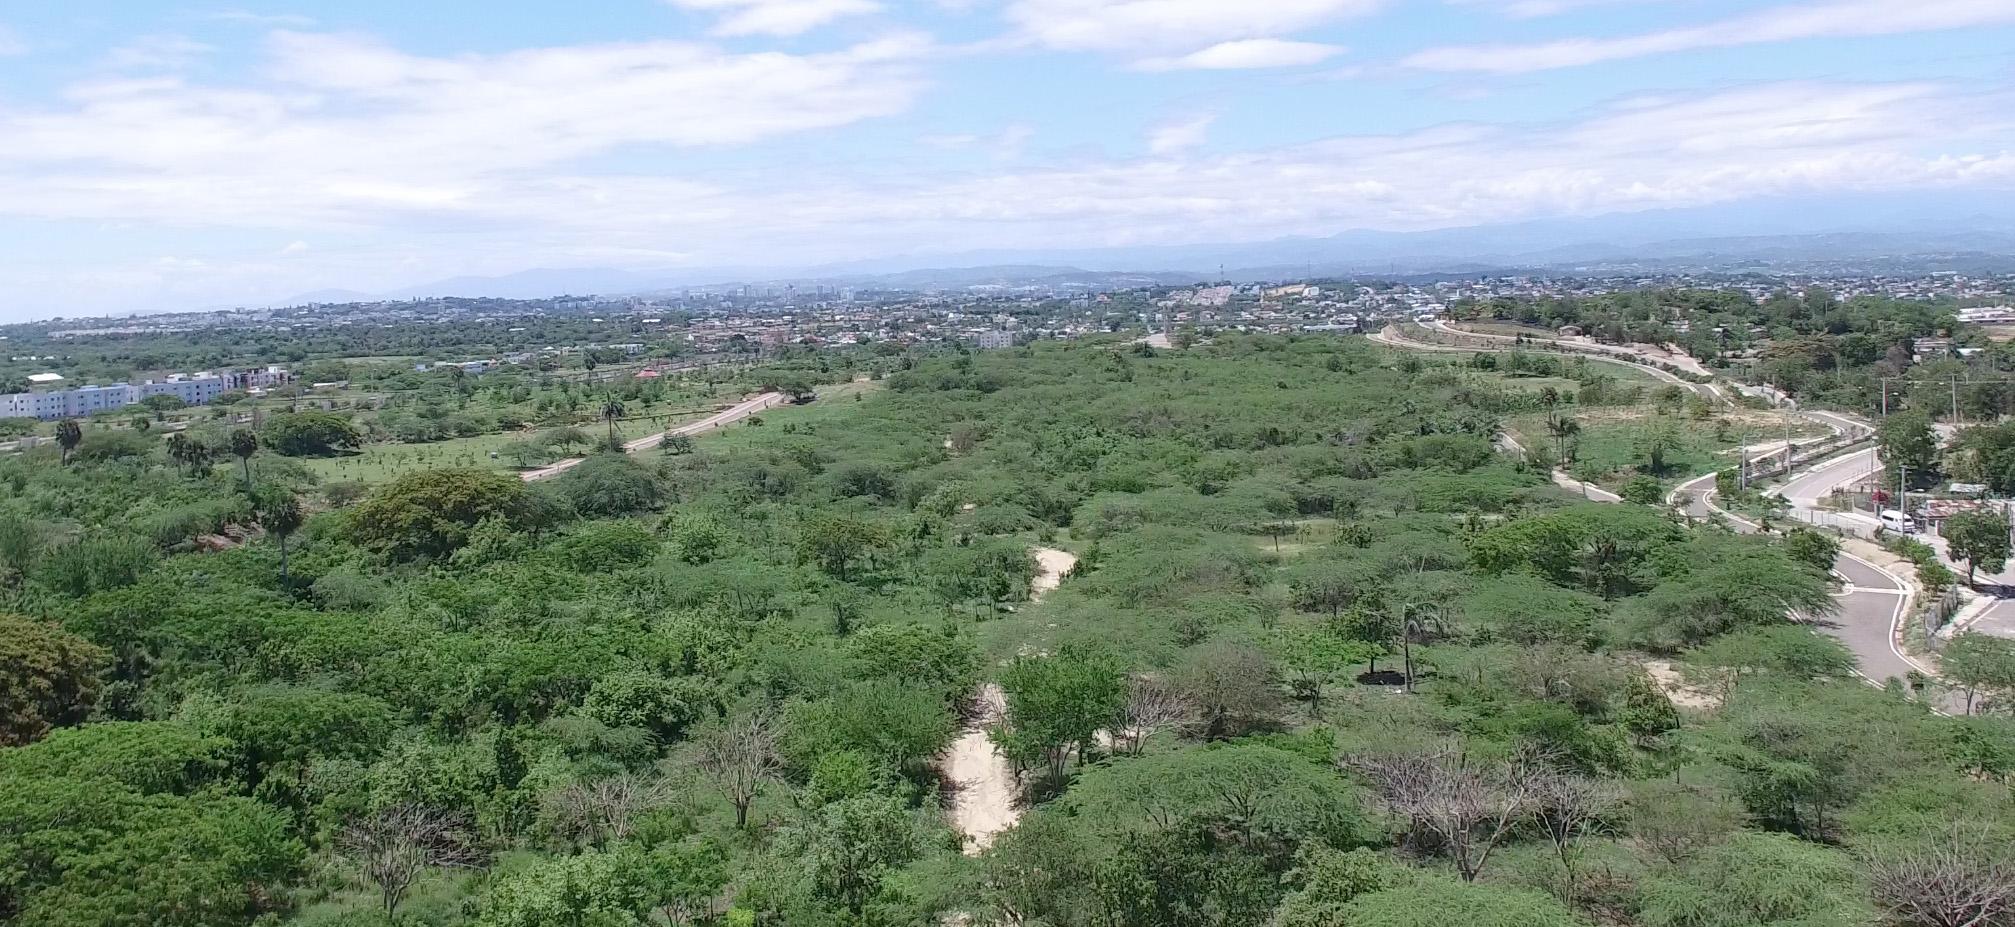 Jardín Botánico de Santiago celebra su primer aniversario